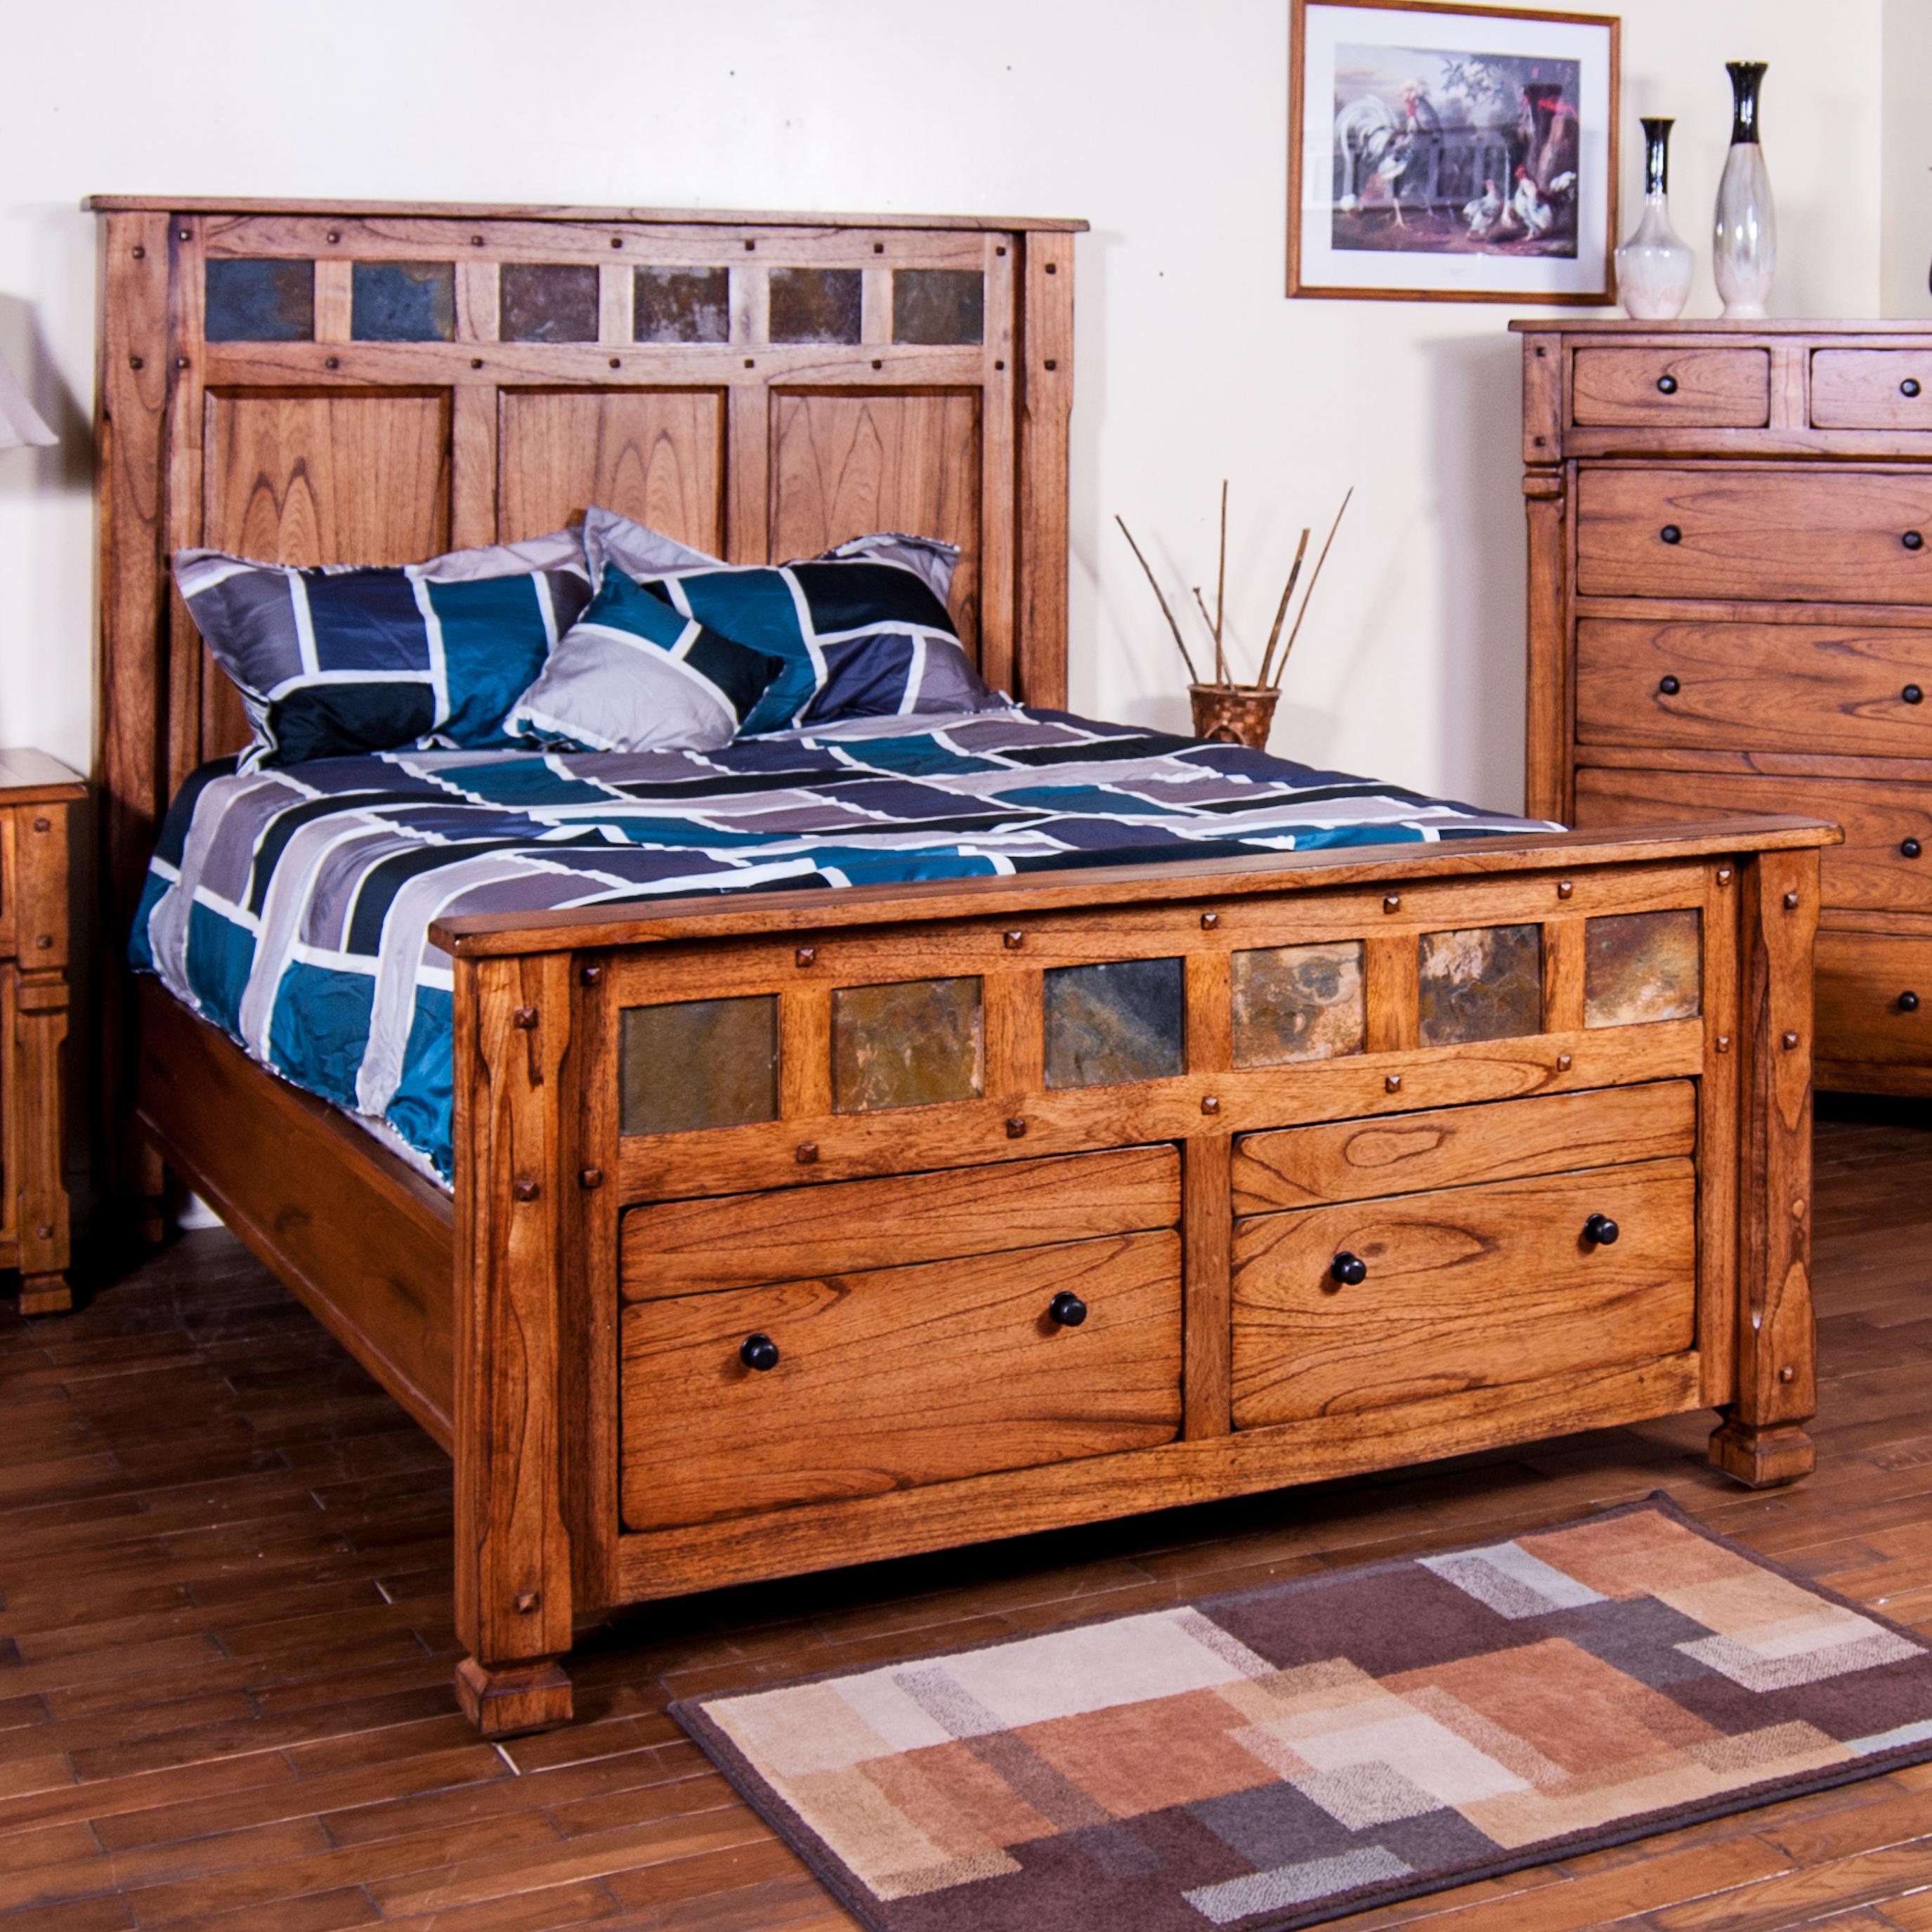 Morris Home Sadler King Bed w/ Storage by Sunny Designs at Morris Home